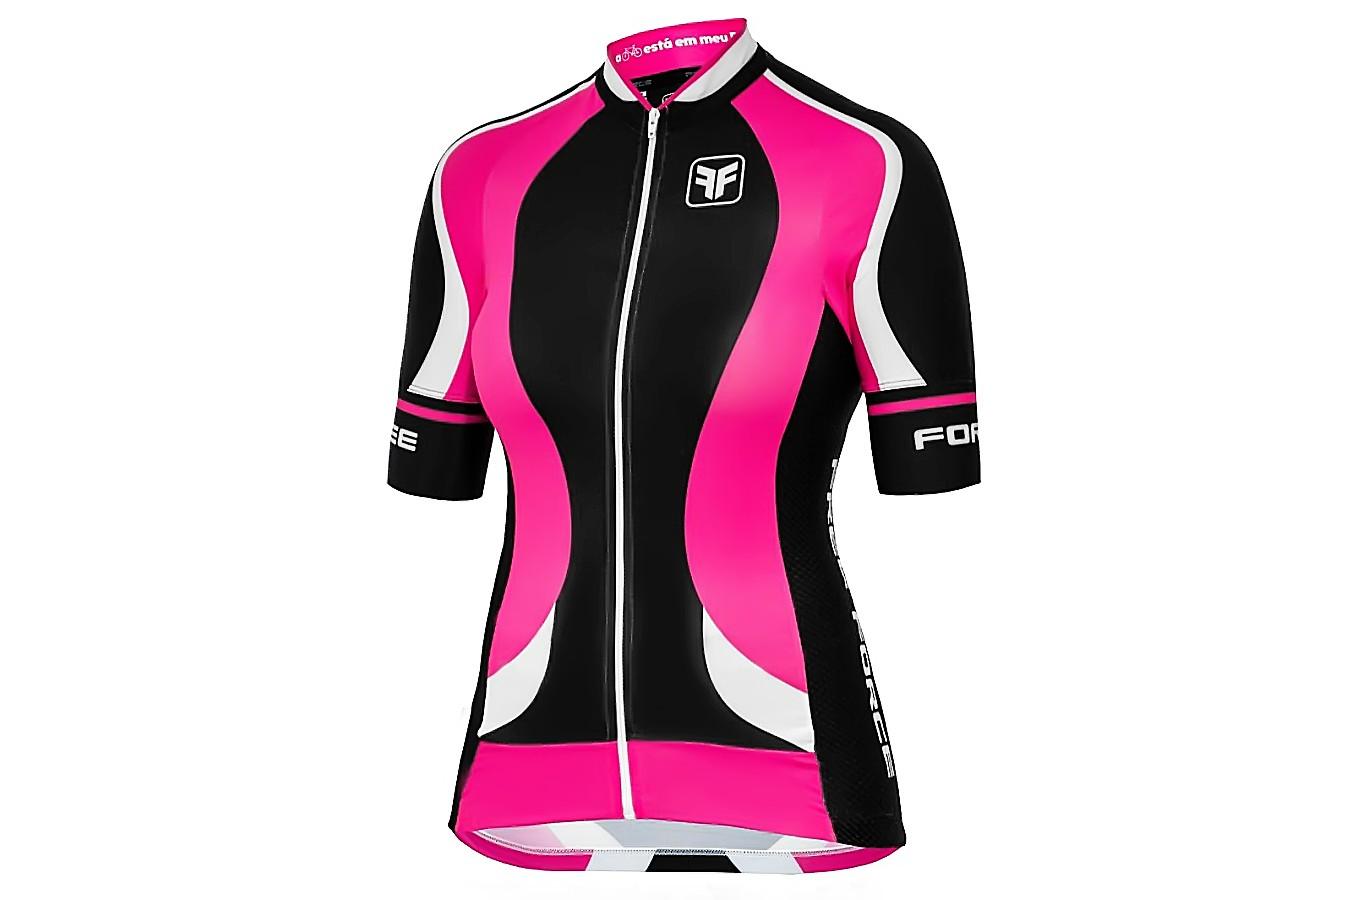 Camisa Ciclismo Feminina Mulher Maravilha Invicto Cam045 85781de7e10ea